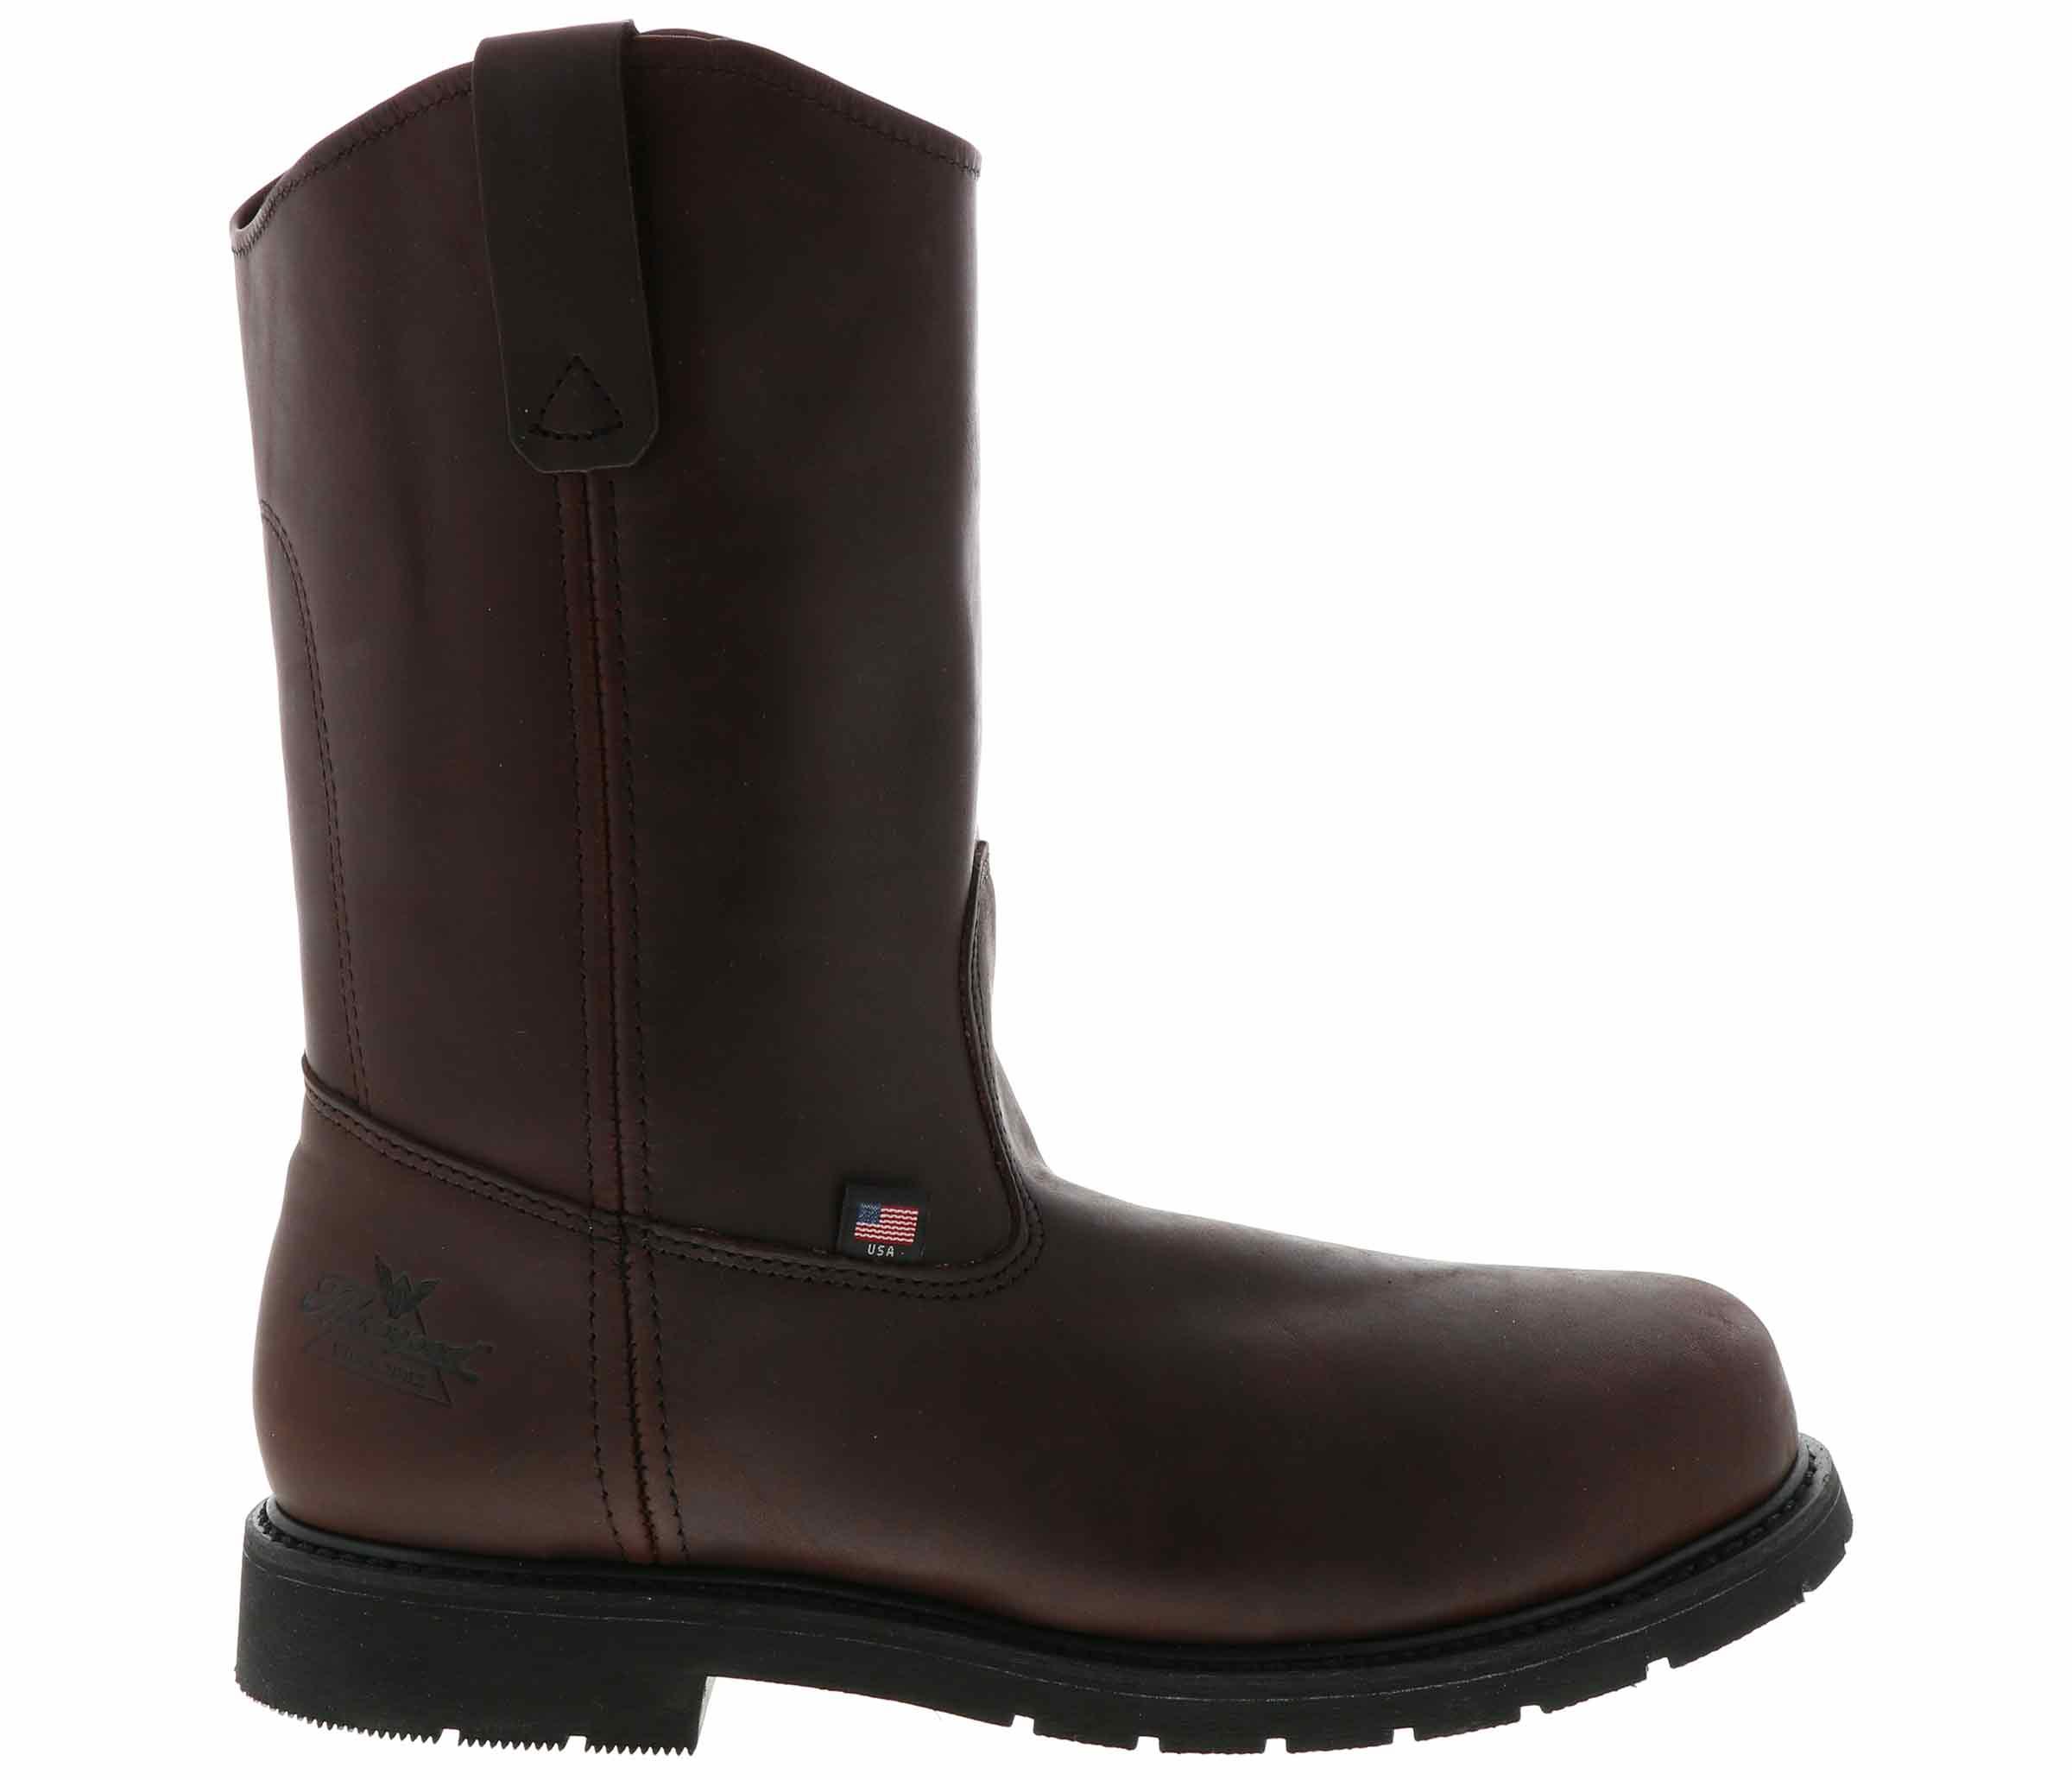 df584de18e8 Men's Thorogood Oil Rigger Steel Toe